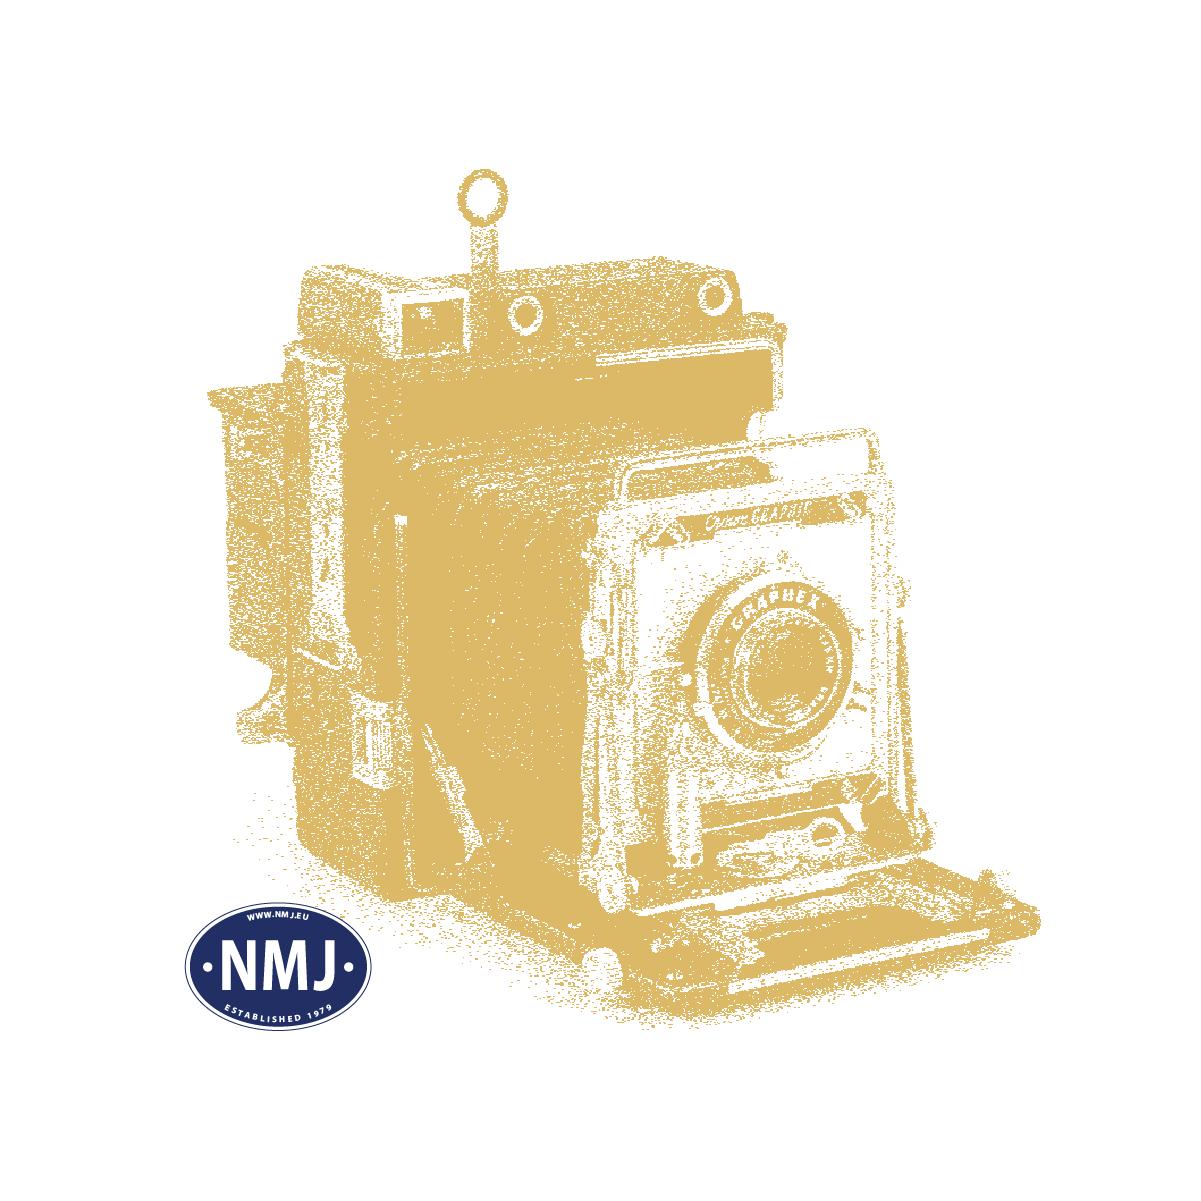 NMJS30b361 - NMJ Superline NSB Type 30b 361, Originalversjon